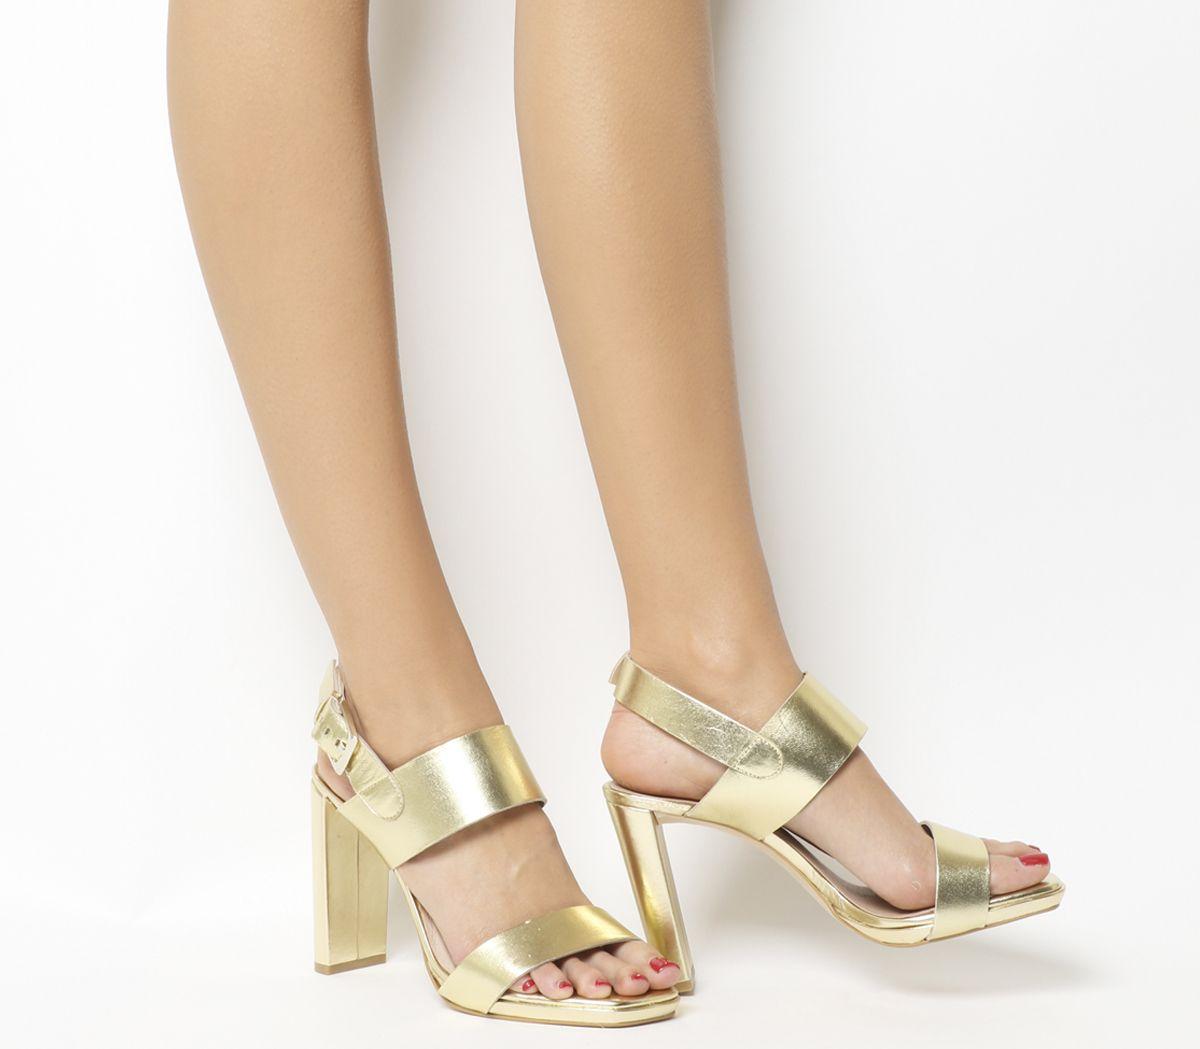 50febc42cae Office Howl Slingback Slim Block Heels Gold Leather - High Heels